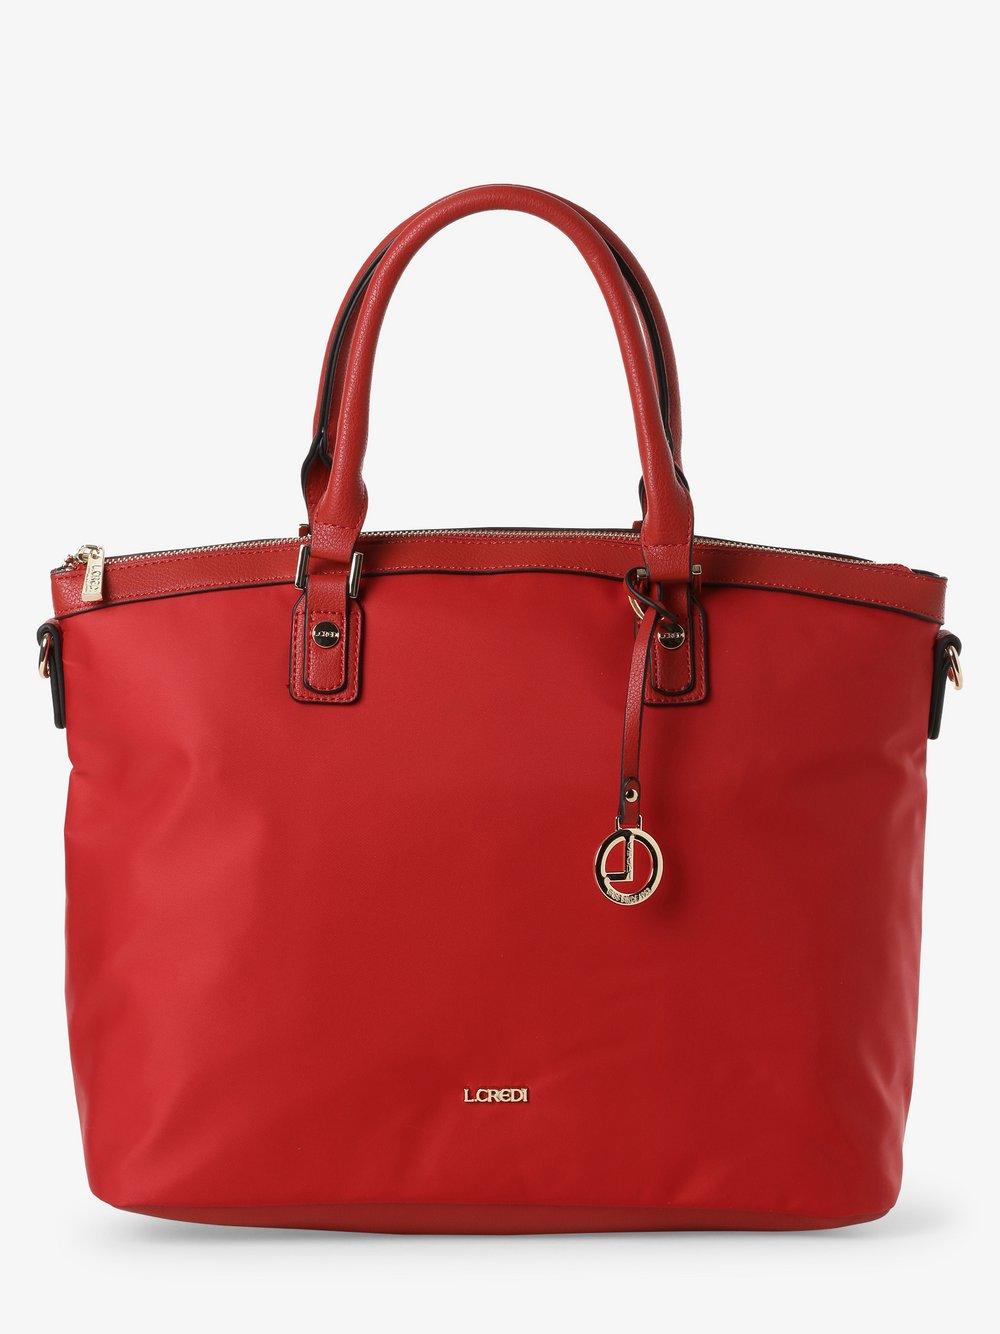 L.Credi - Damska torba shopper – Elena, czerwony